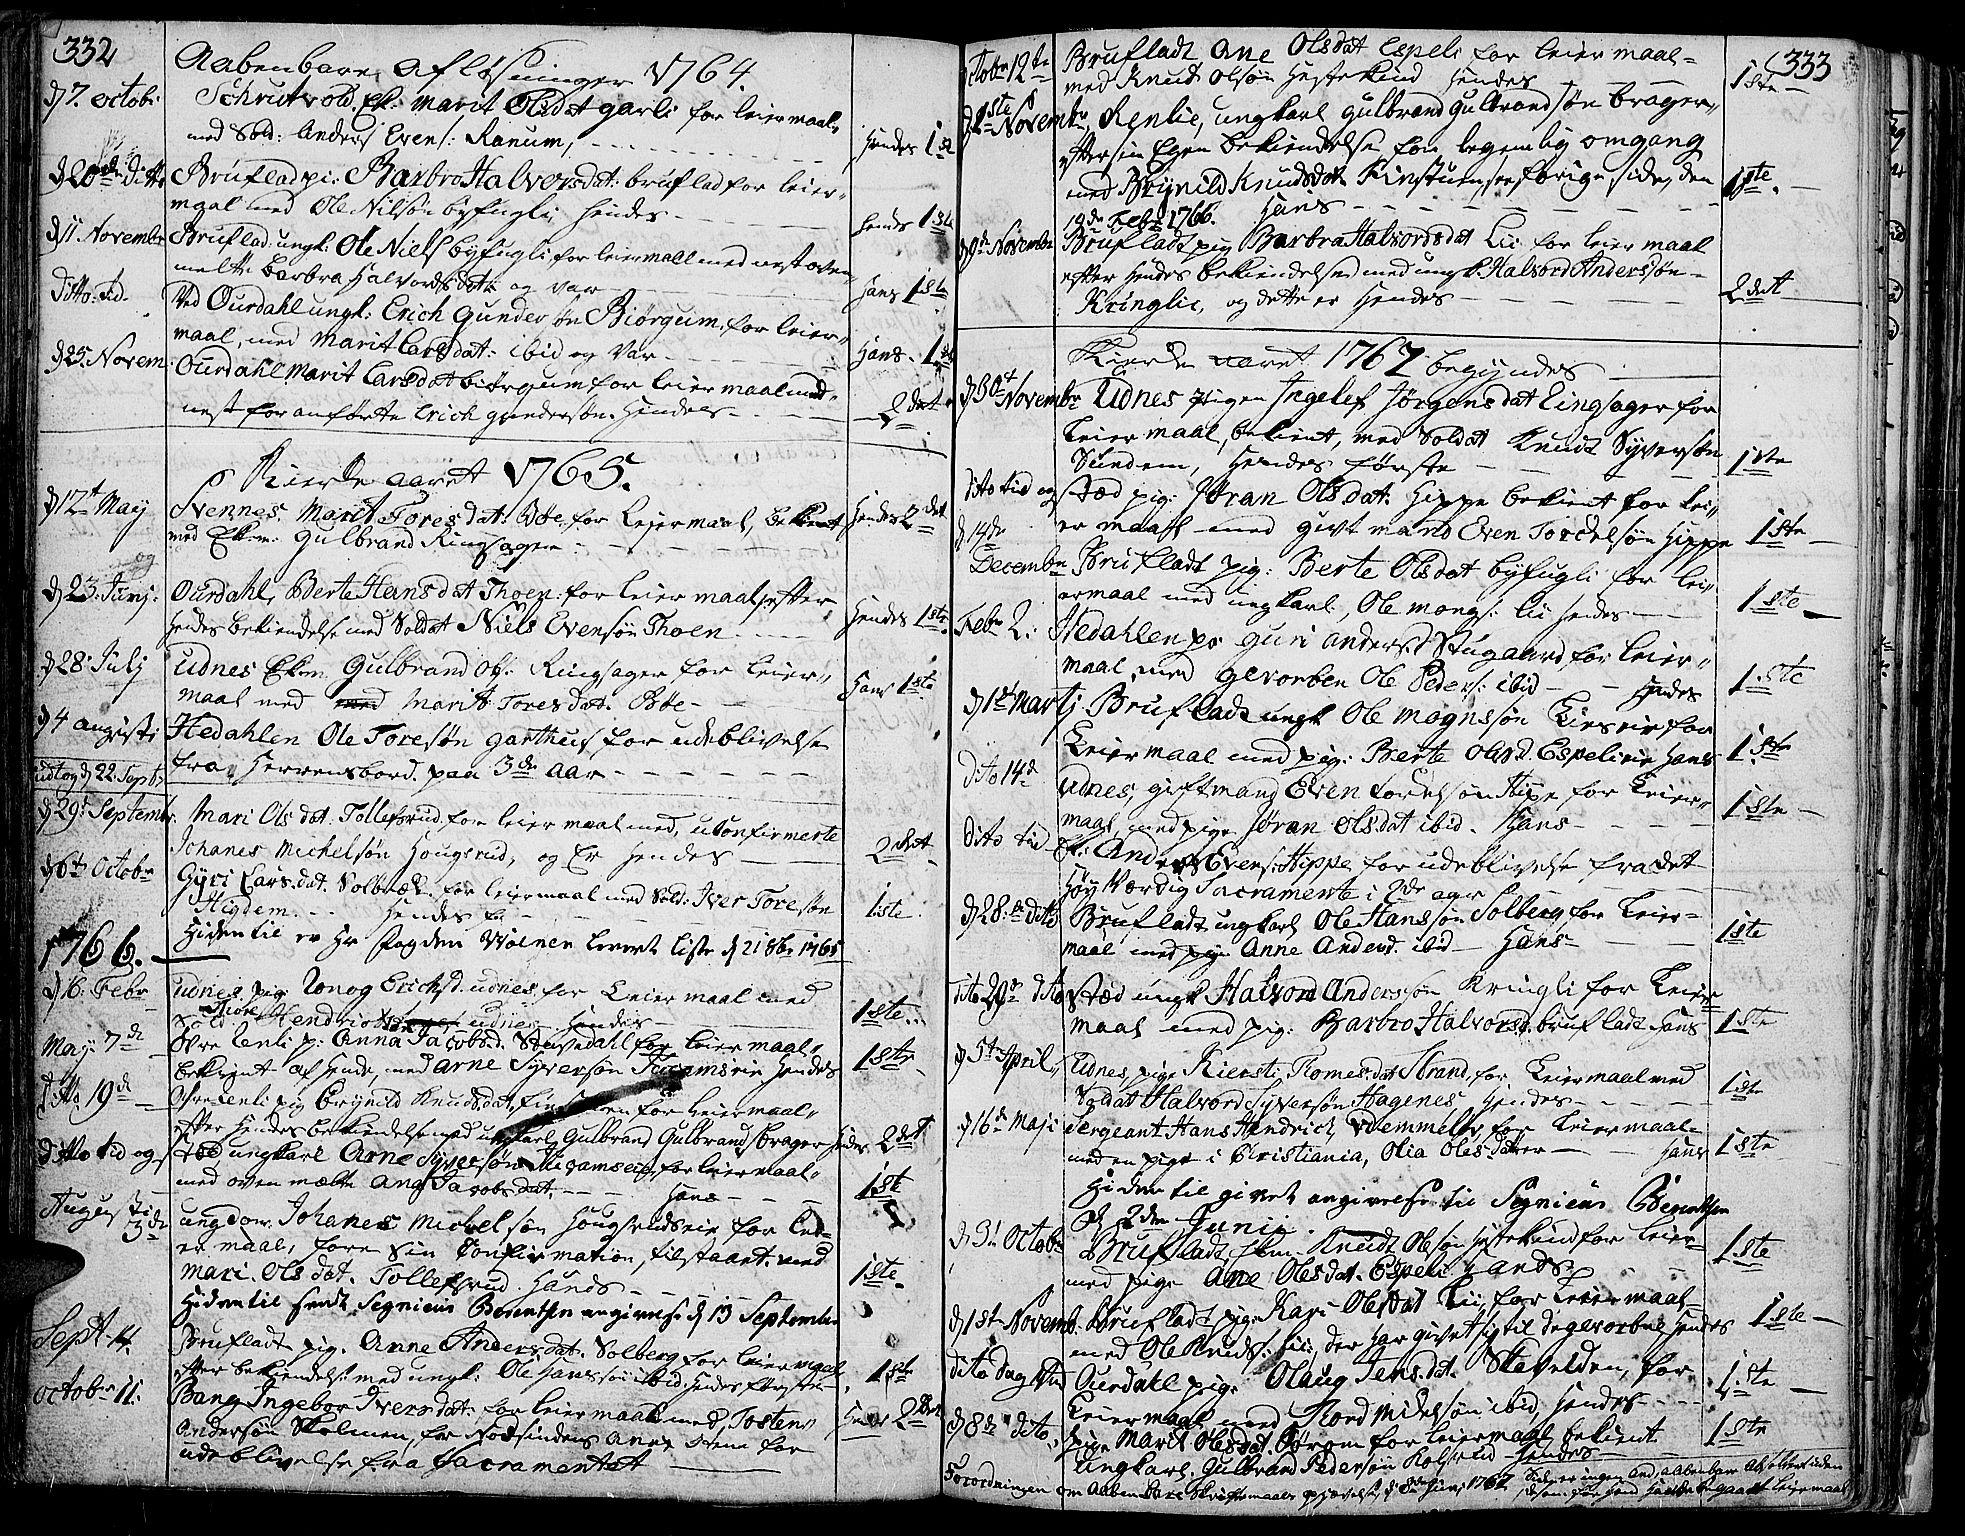 SAH, Aurdal prestekontor, Ministerialbok nr. 5, 1763-1781, s. 332-333